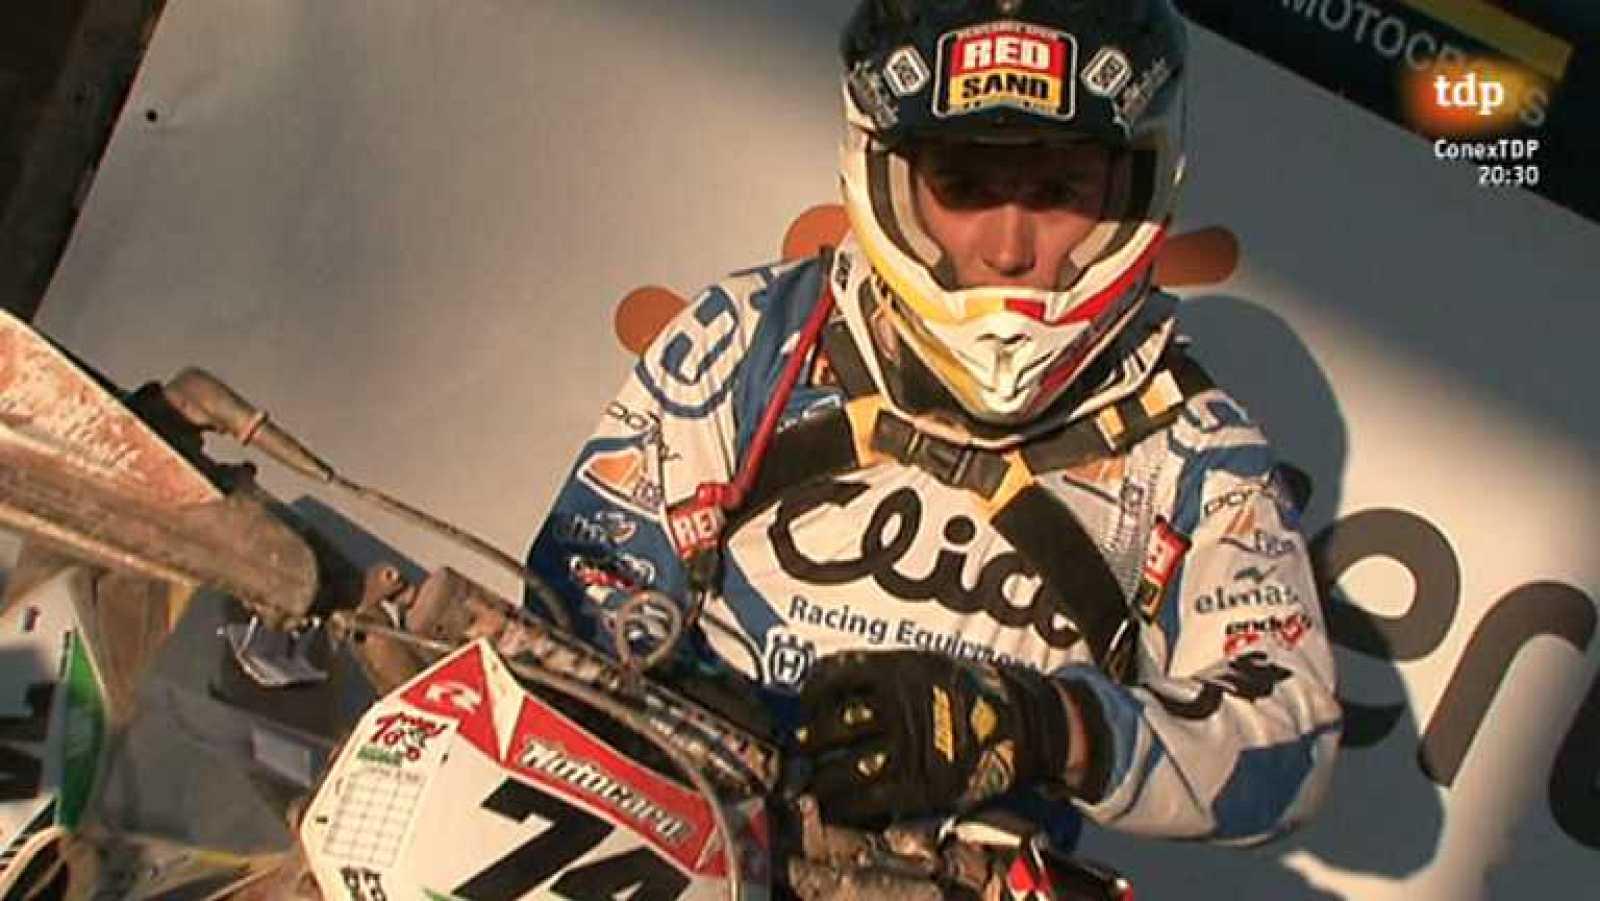 Motociclismo - Campeonato de España de Enduro 2014 - Ver ahora